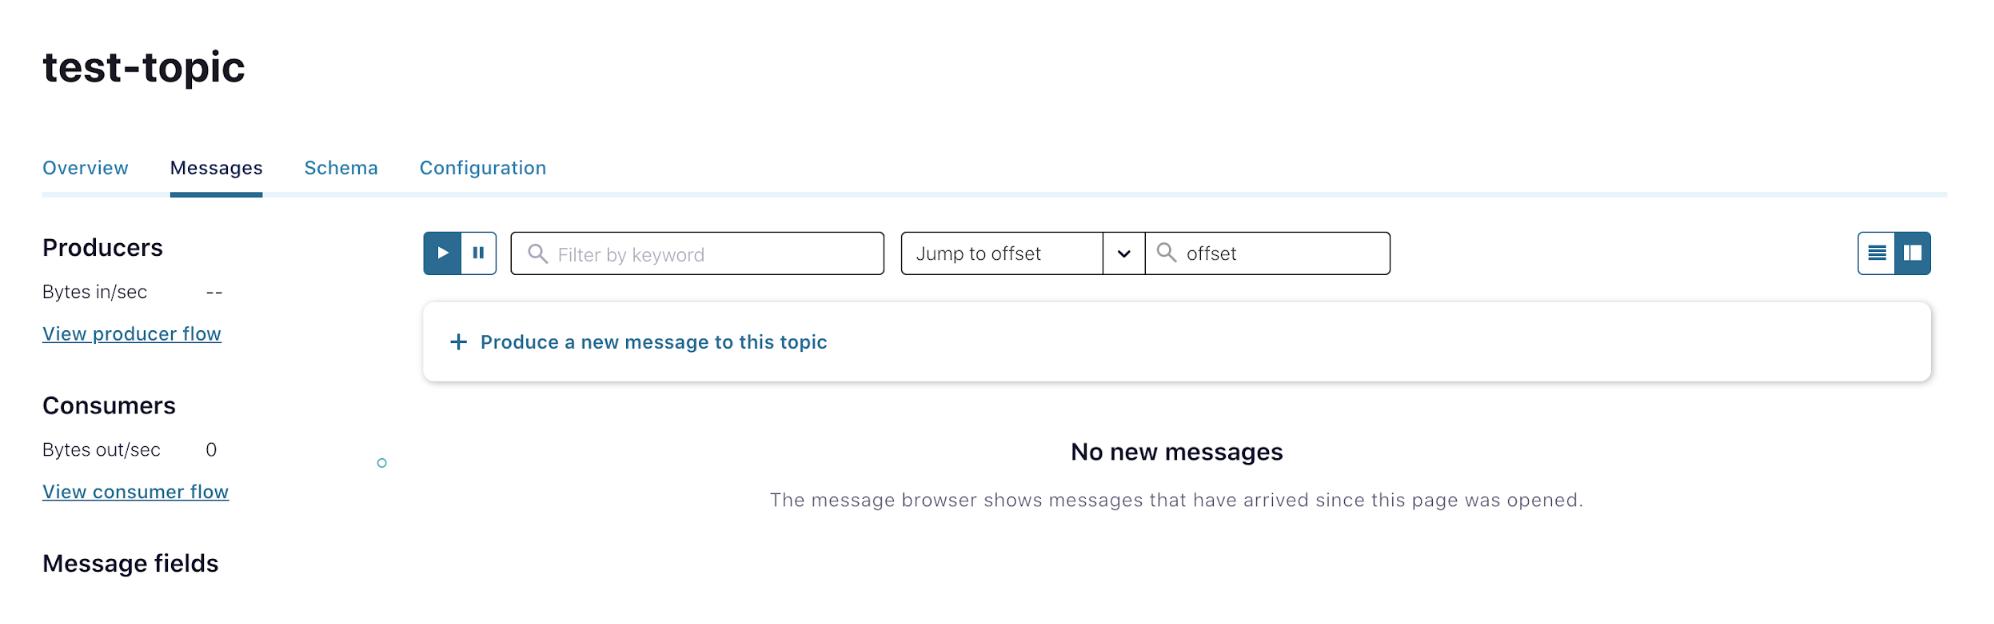 Creating Kafka messages in Confluent Platform